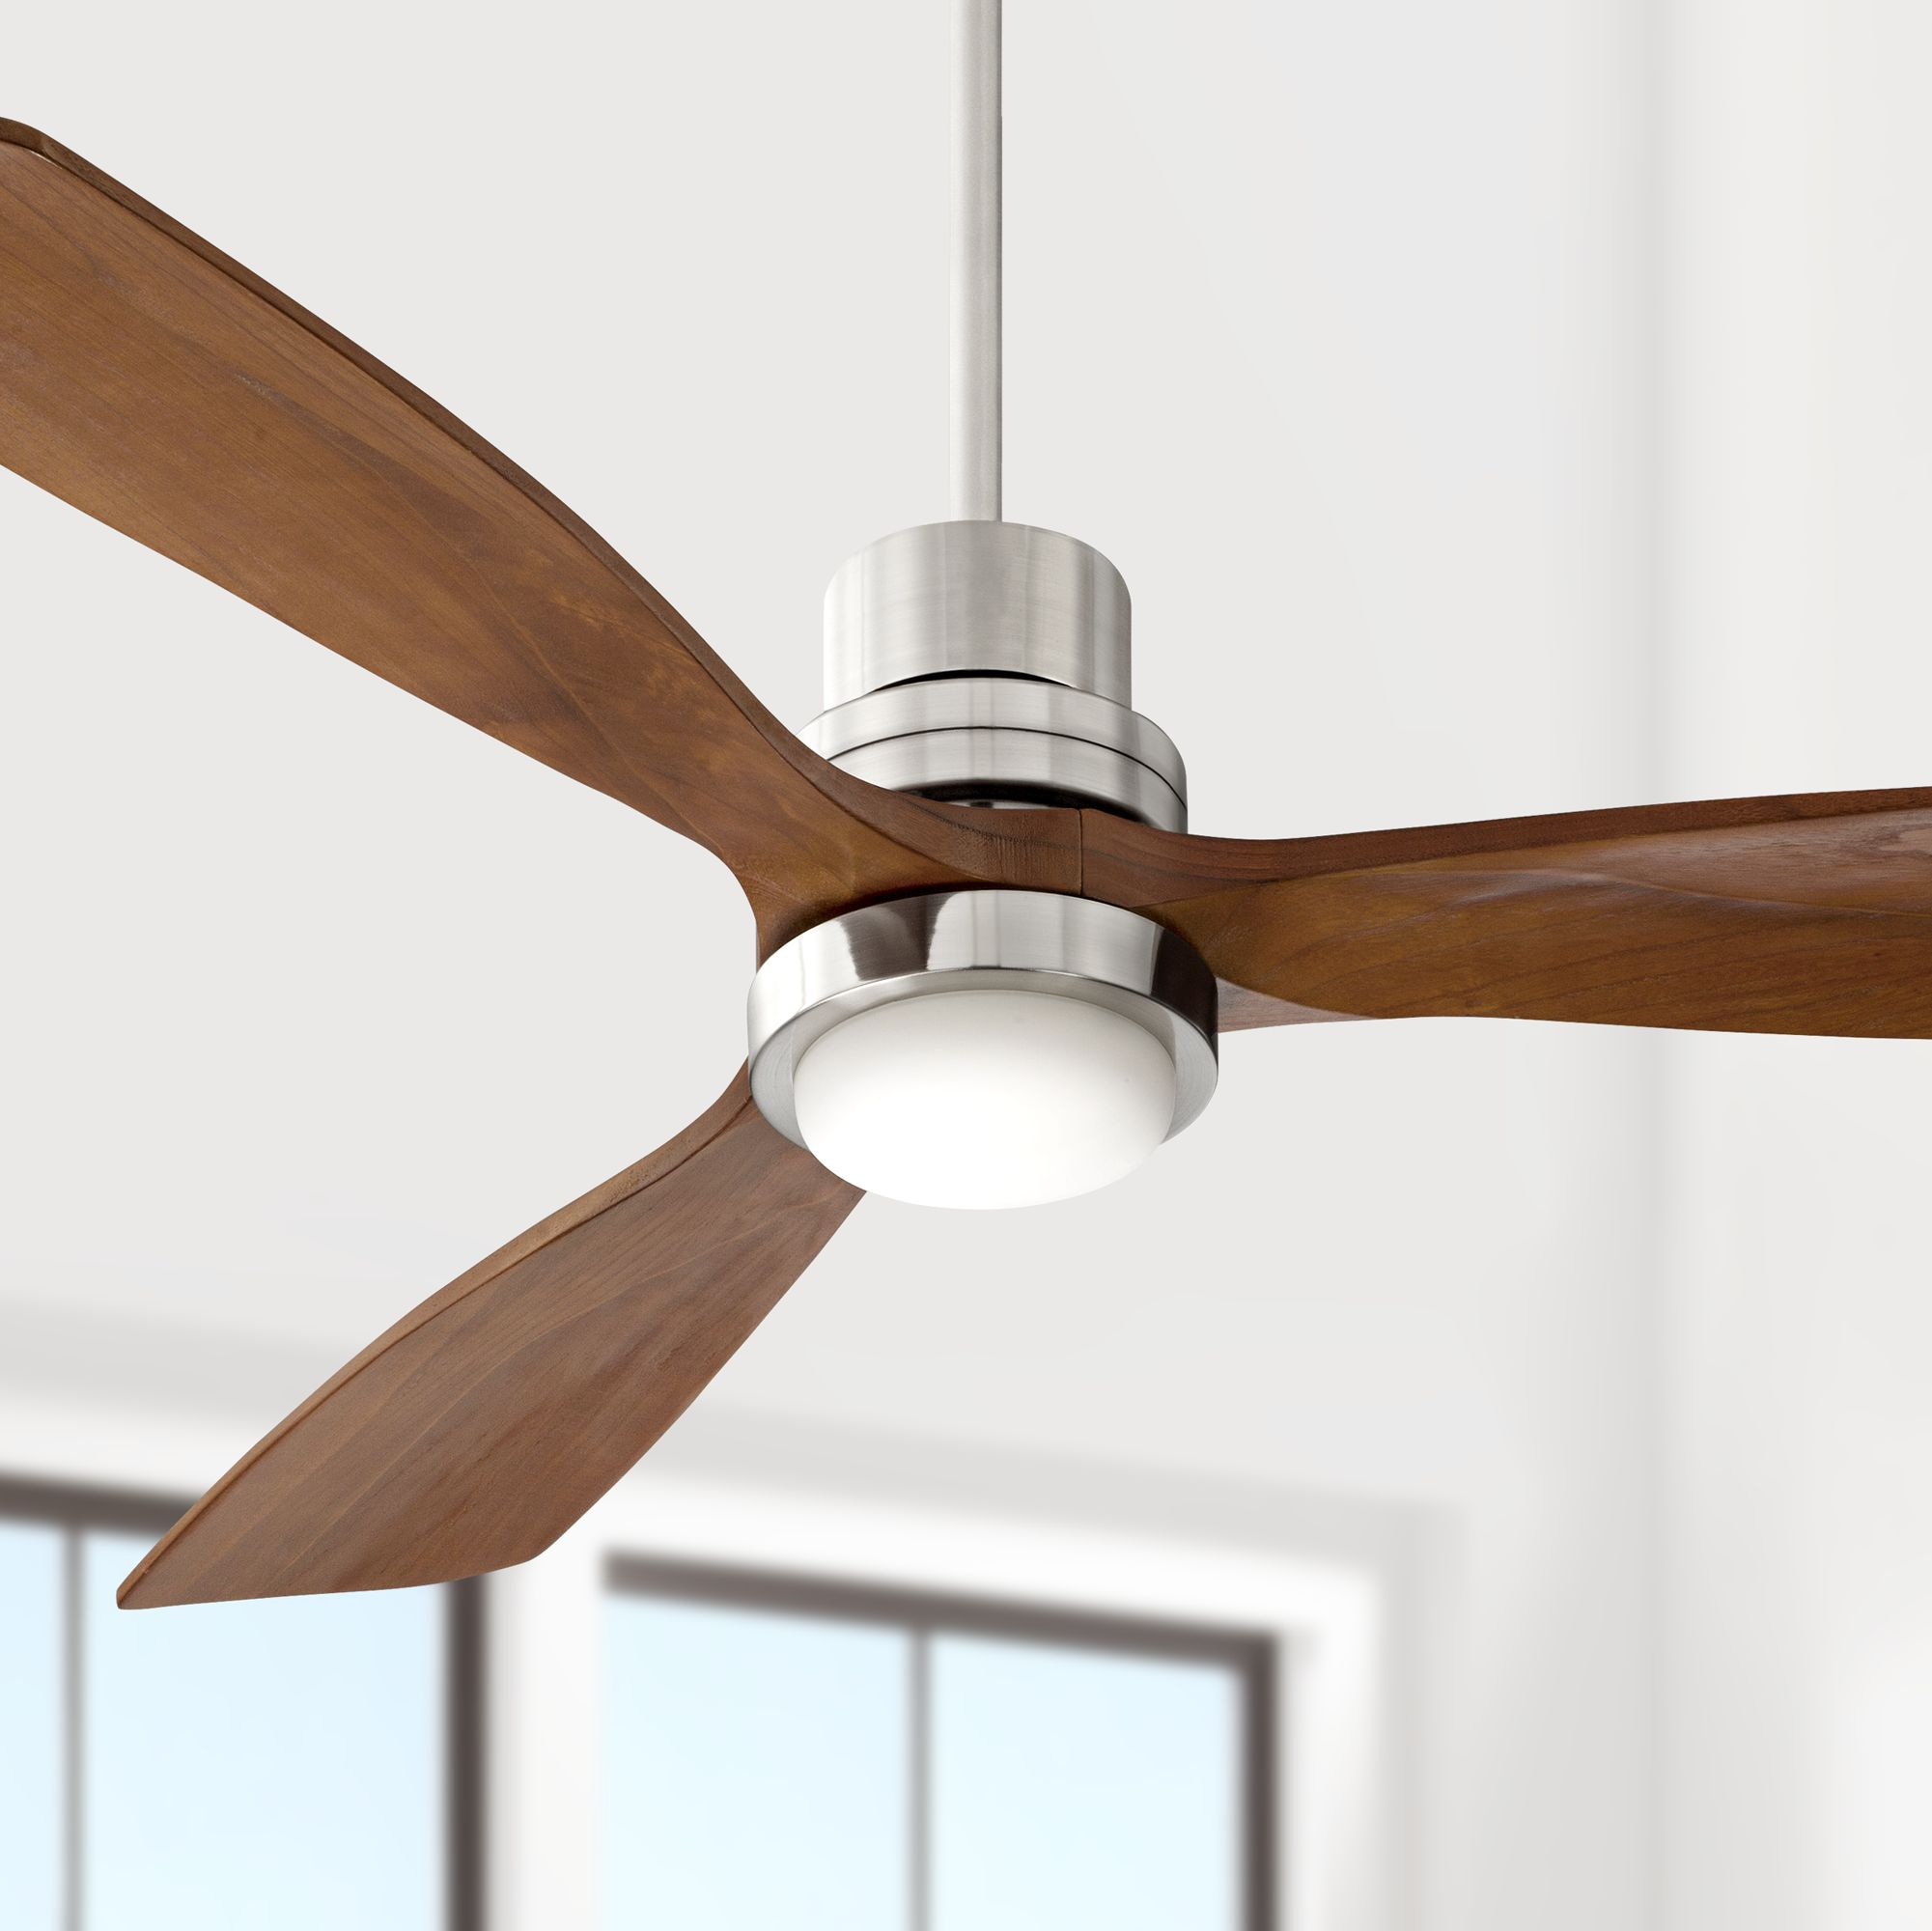 Ceiling fans with light 52 YSRPHOS